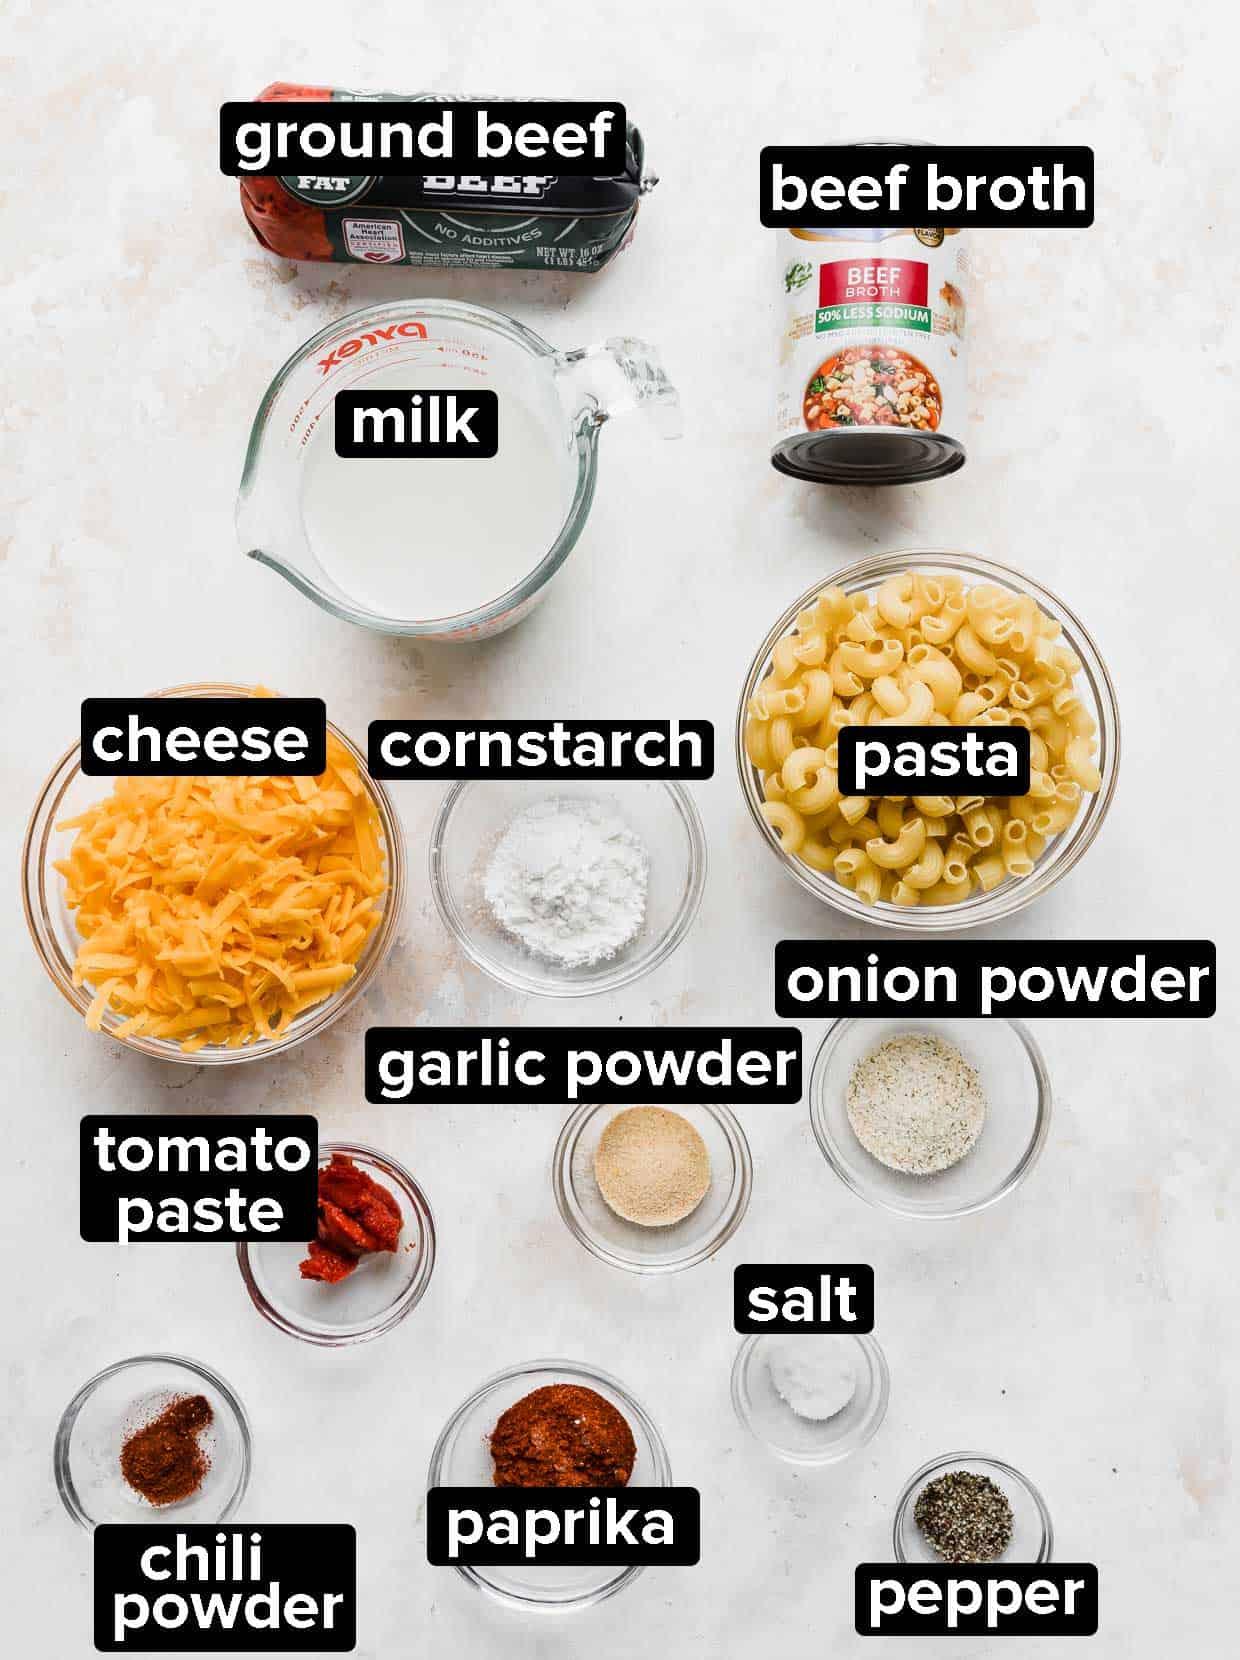 Ingredients used to make homemade hamburger helper.